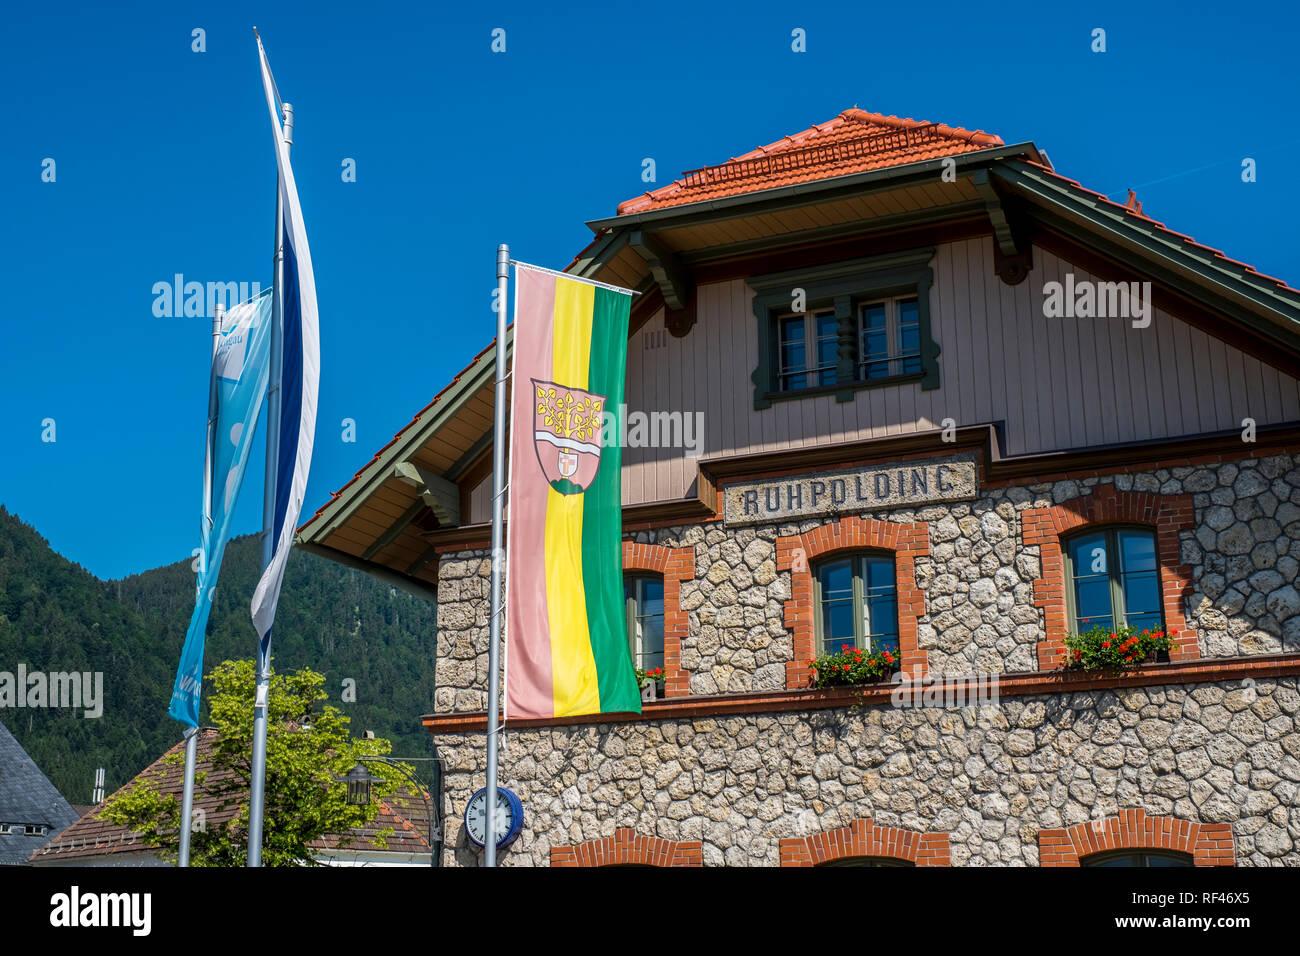 Ruhpolding train station, Upper Bavaria, Germany, Europe - Stock Image